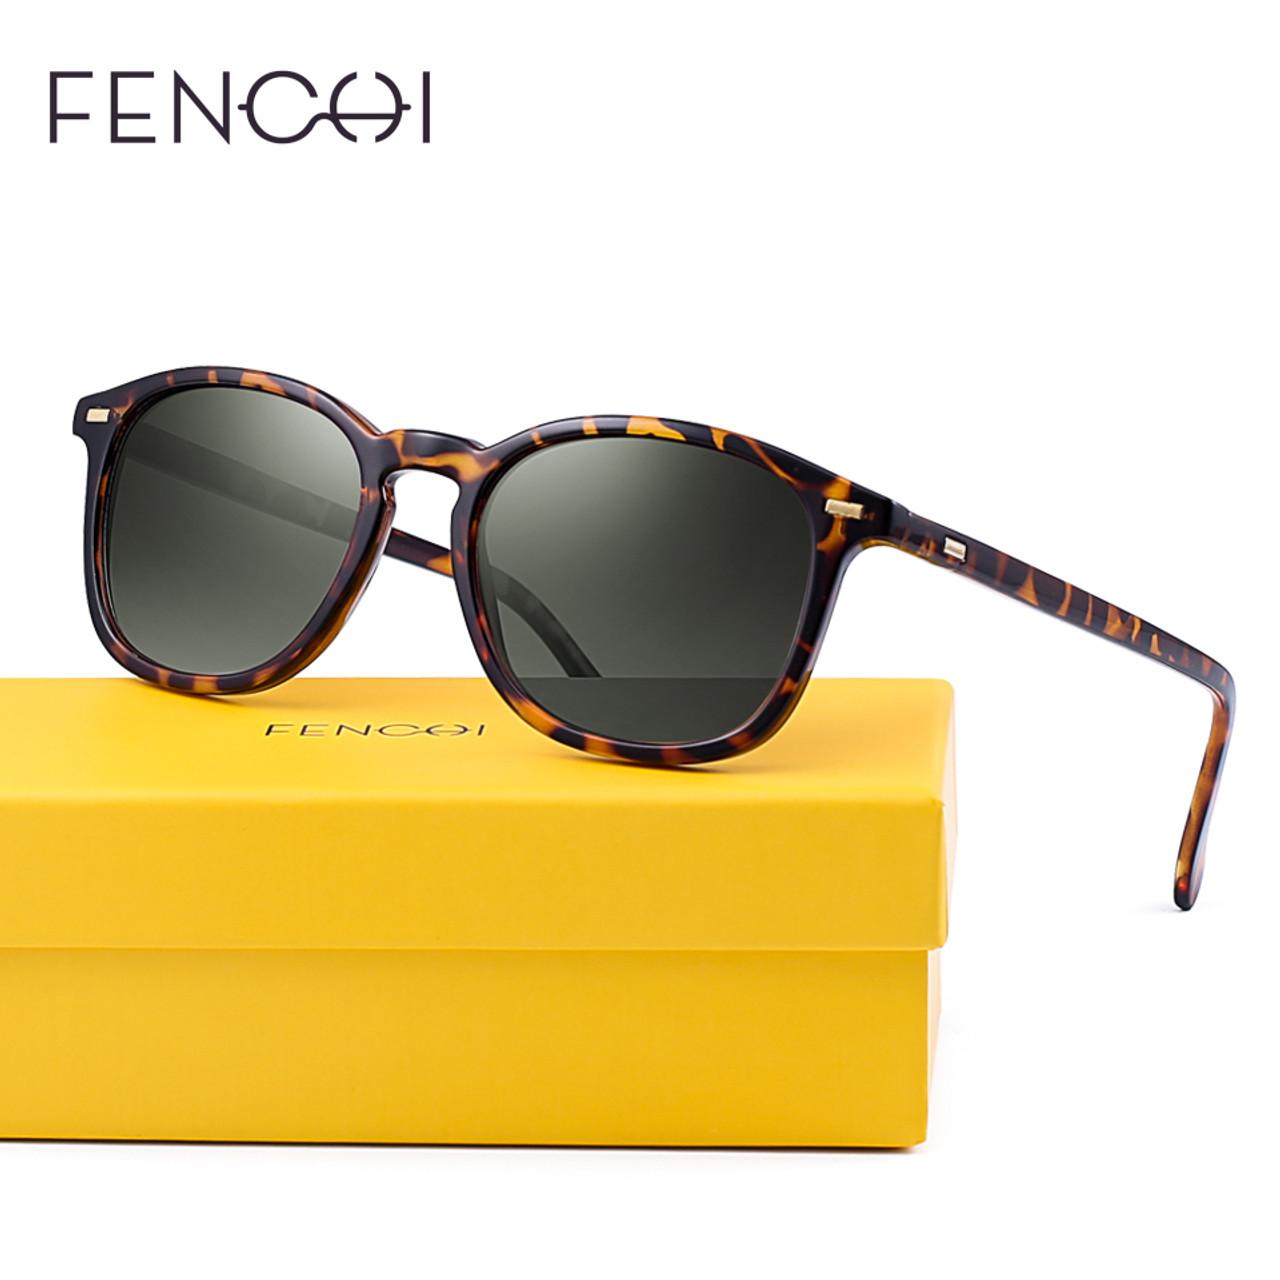 ad999f39b2 ... FENCHI Fashion New Square Polarized Sunglasses Men Women Vintage Retro  Brand Designer Sun glasses UV400 ...